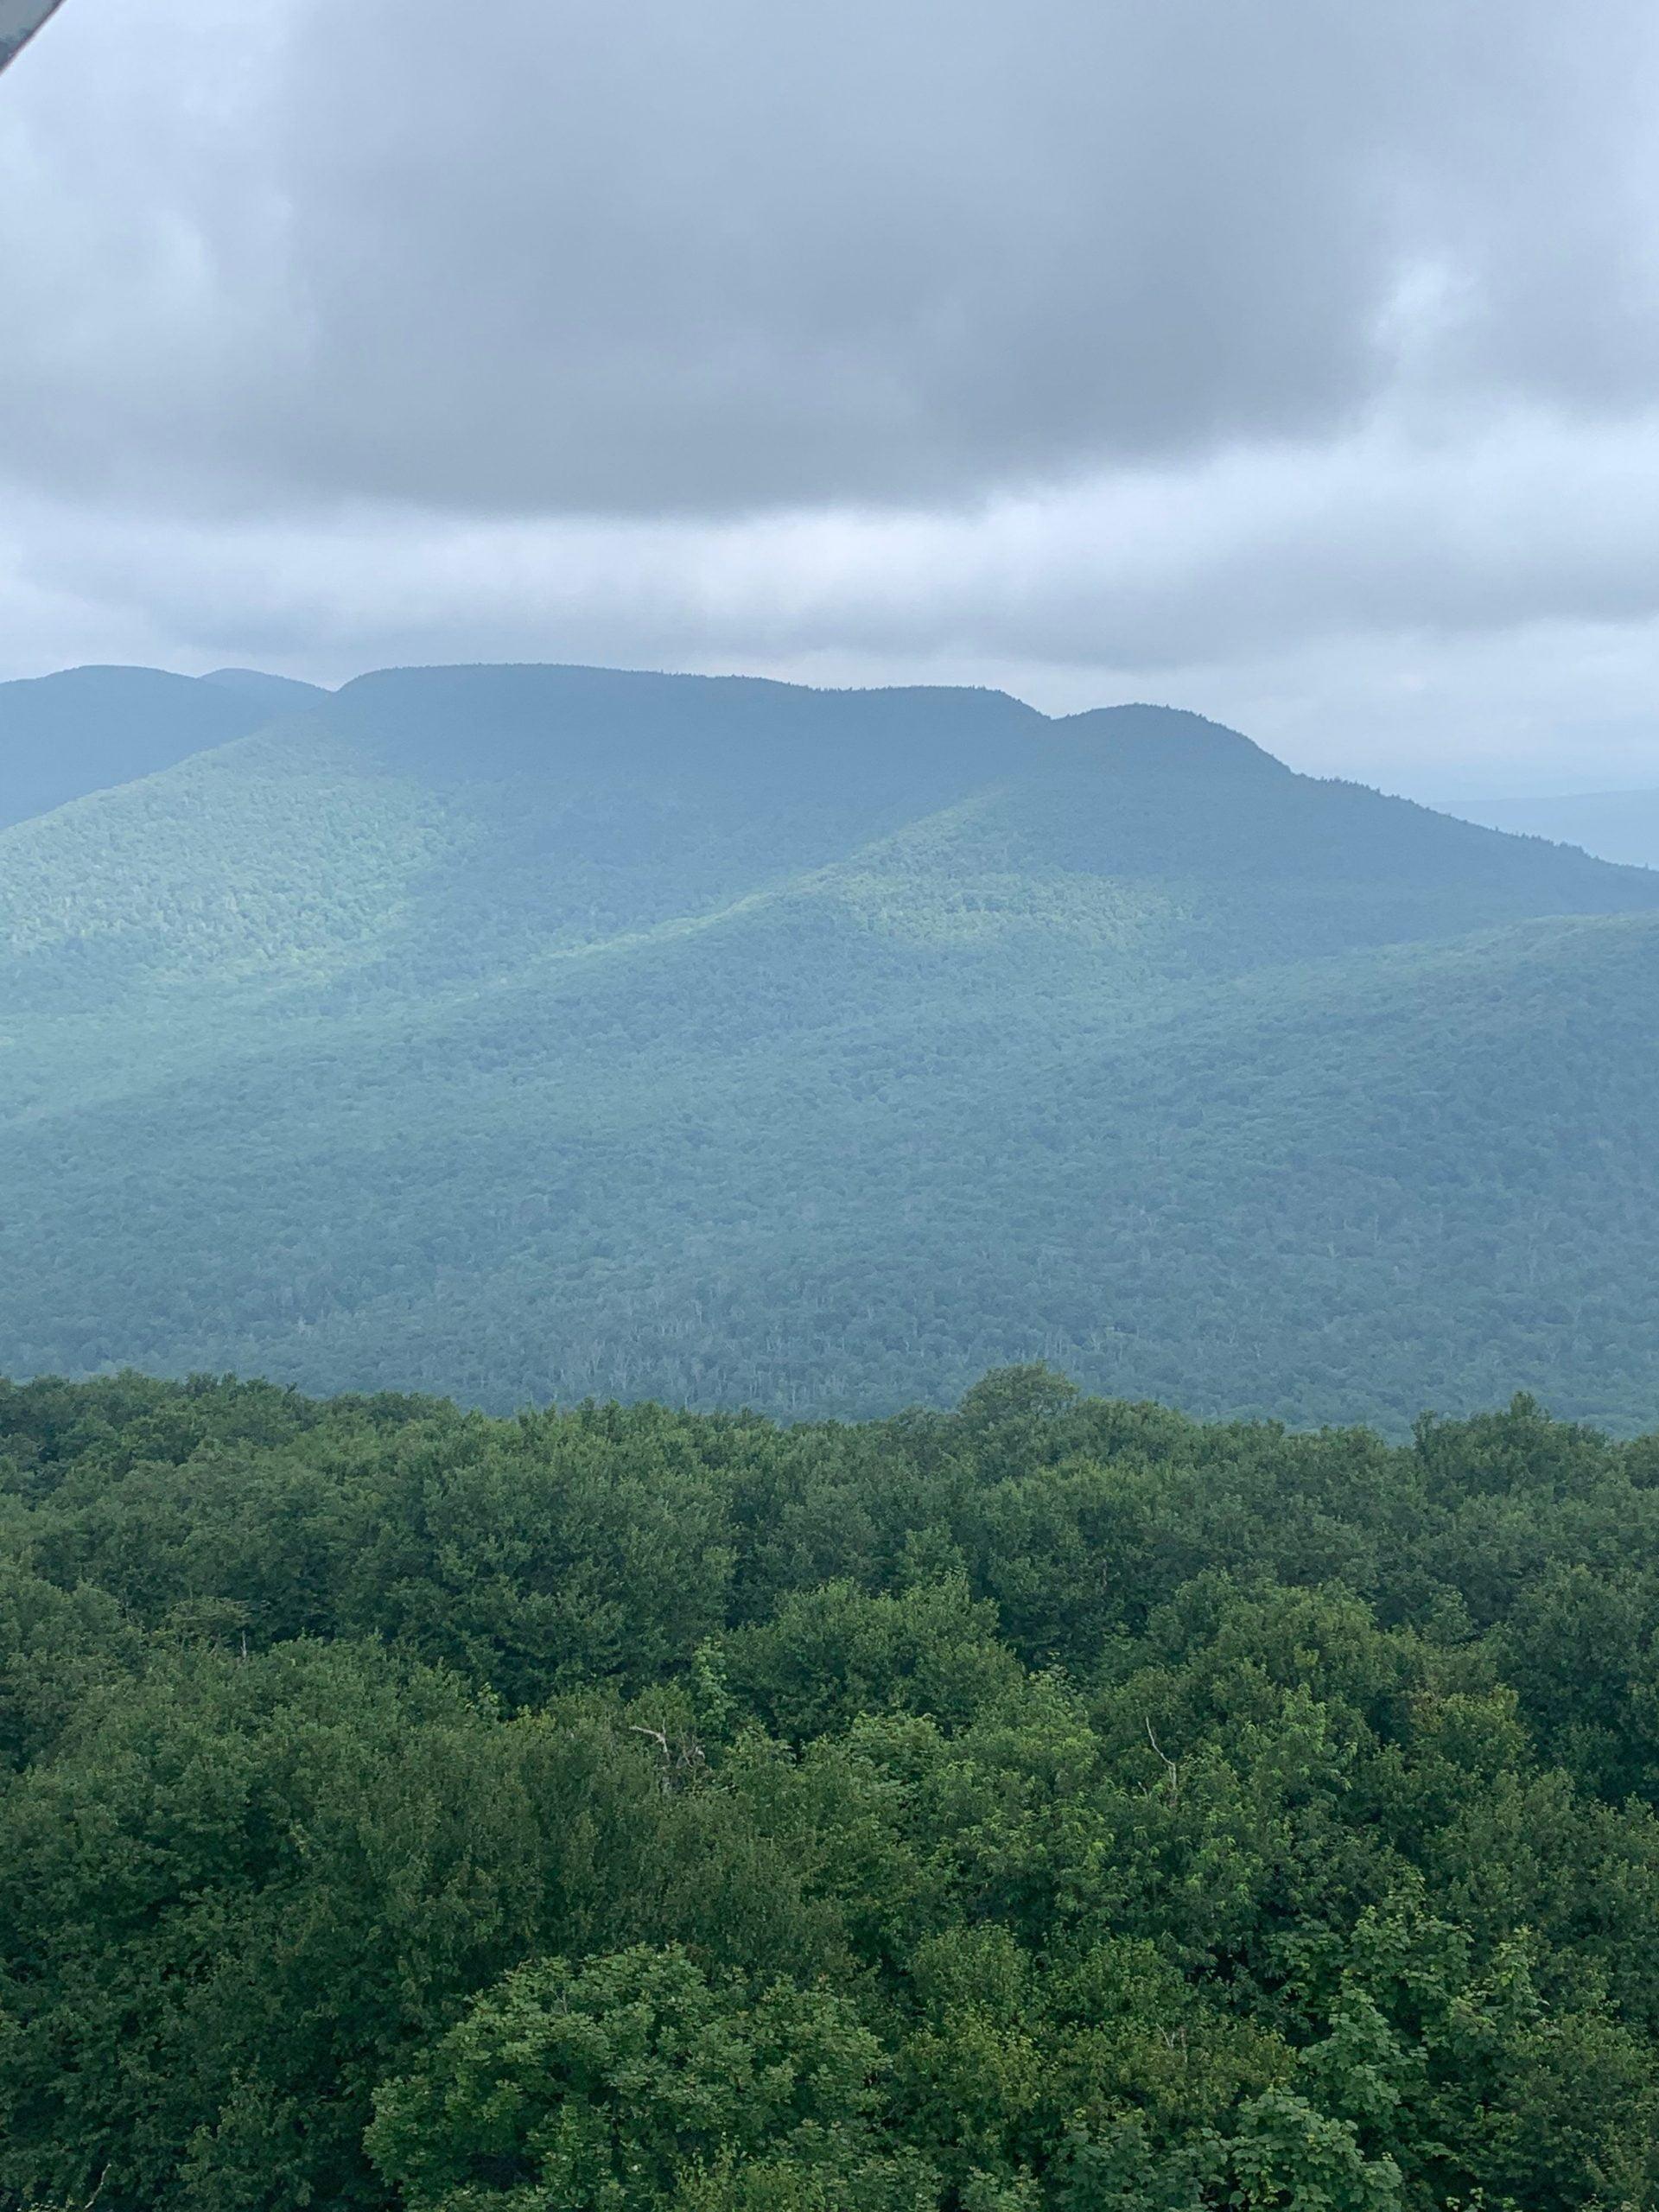 Overlook Mountain Fire Tower